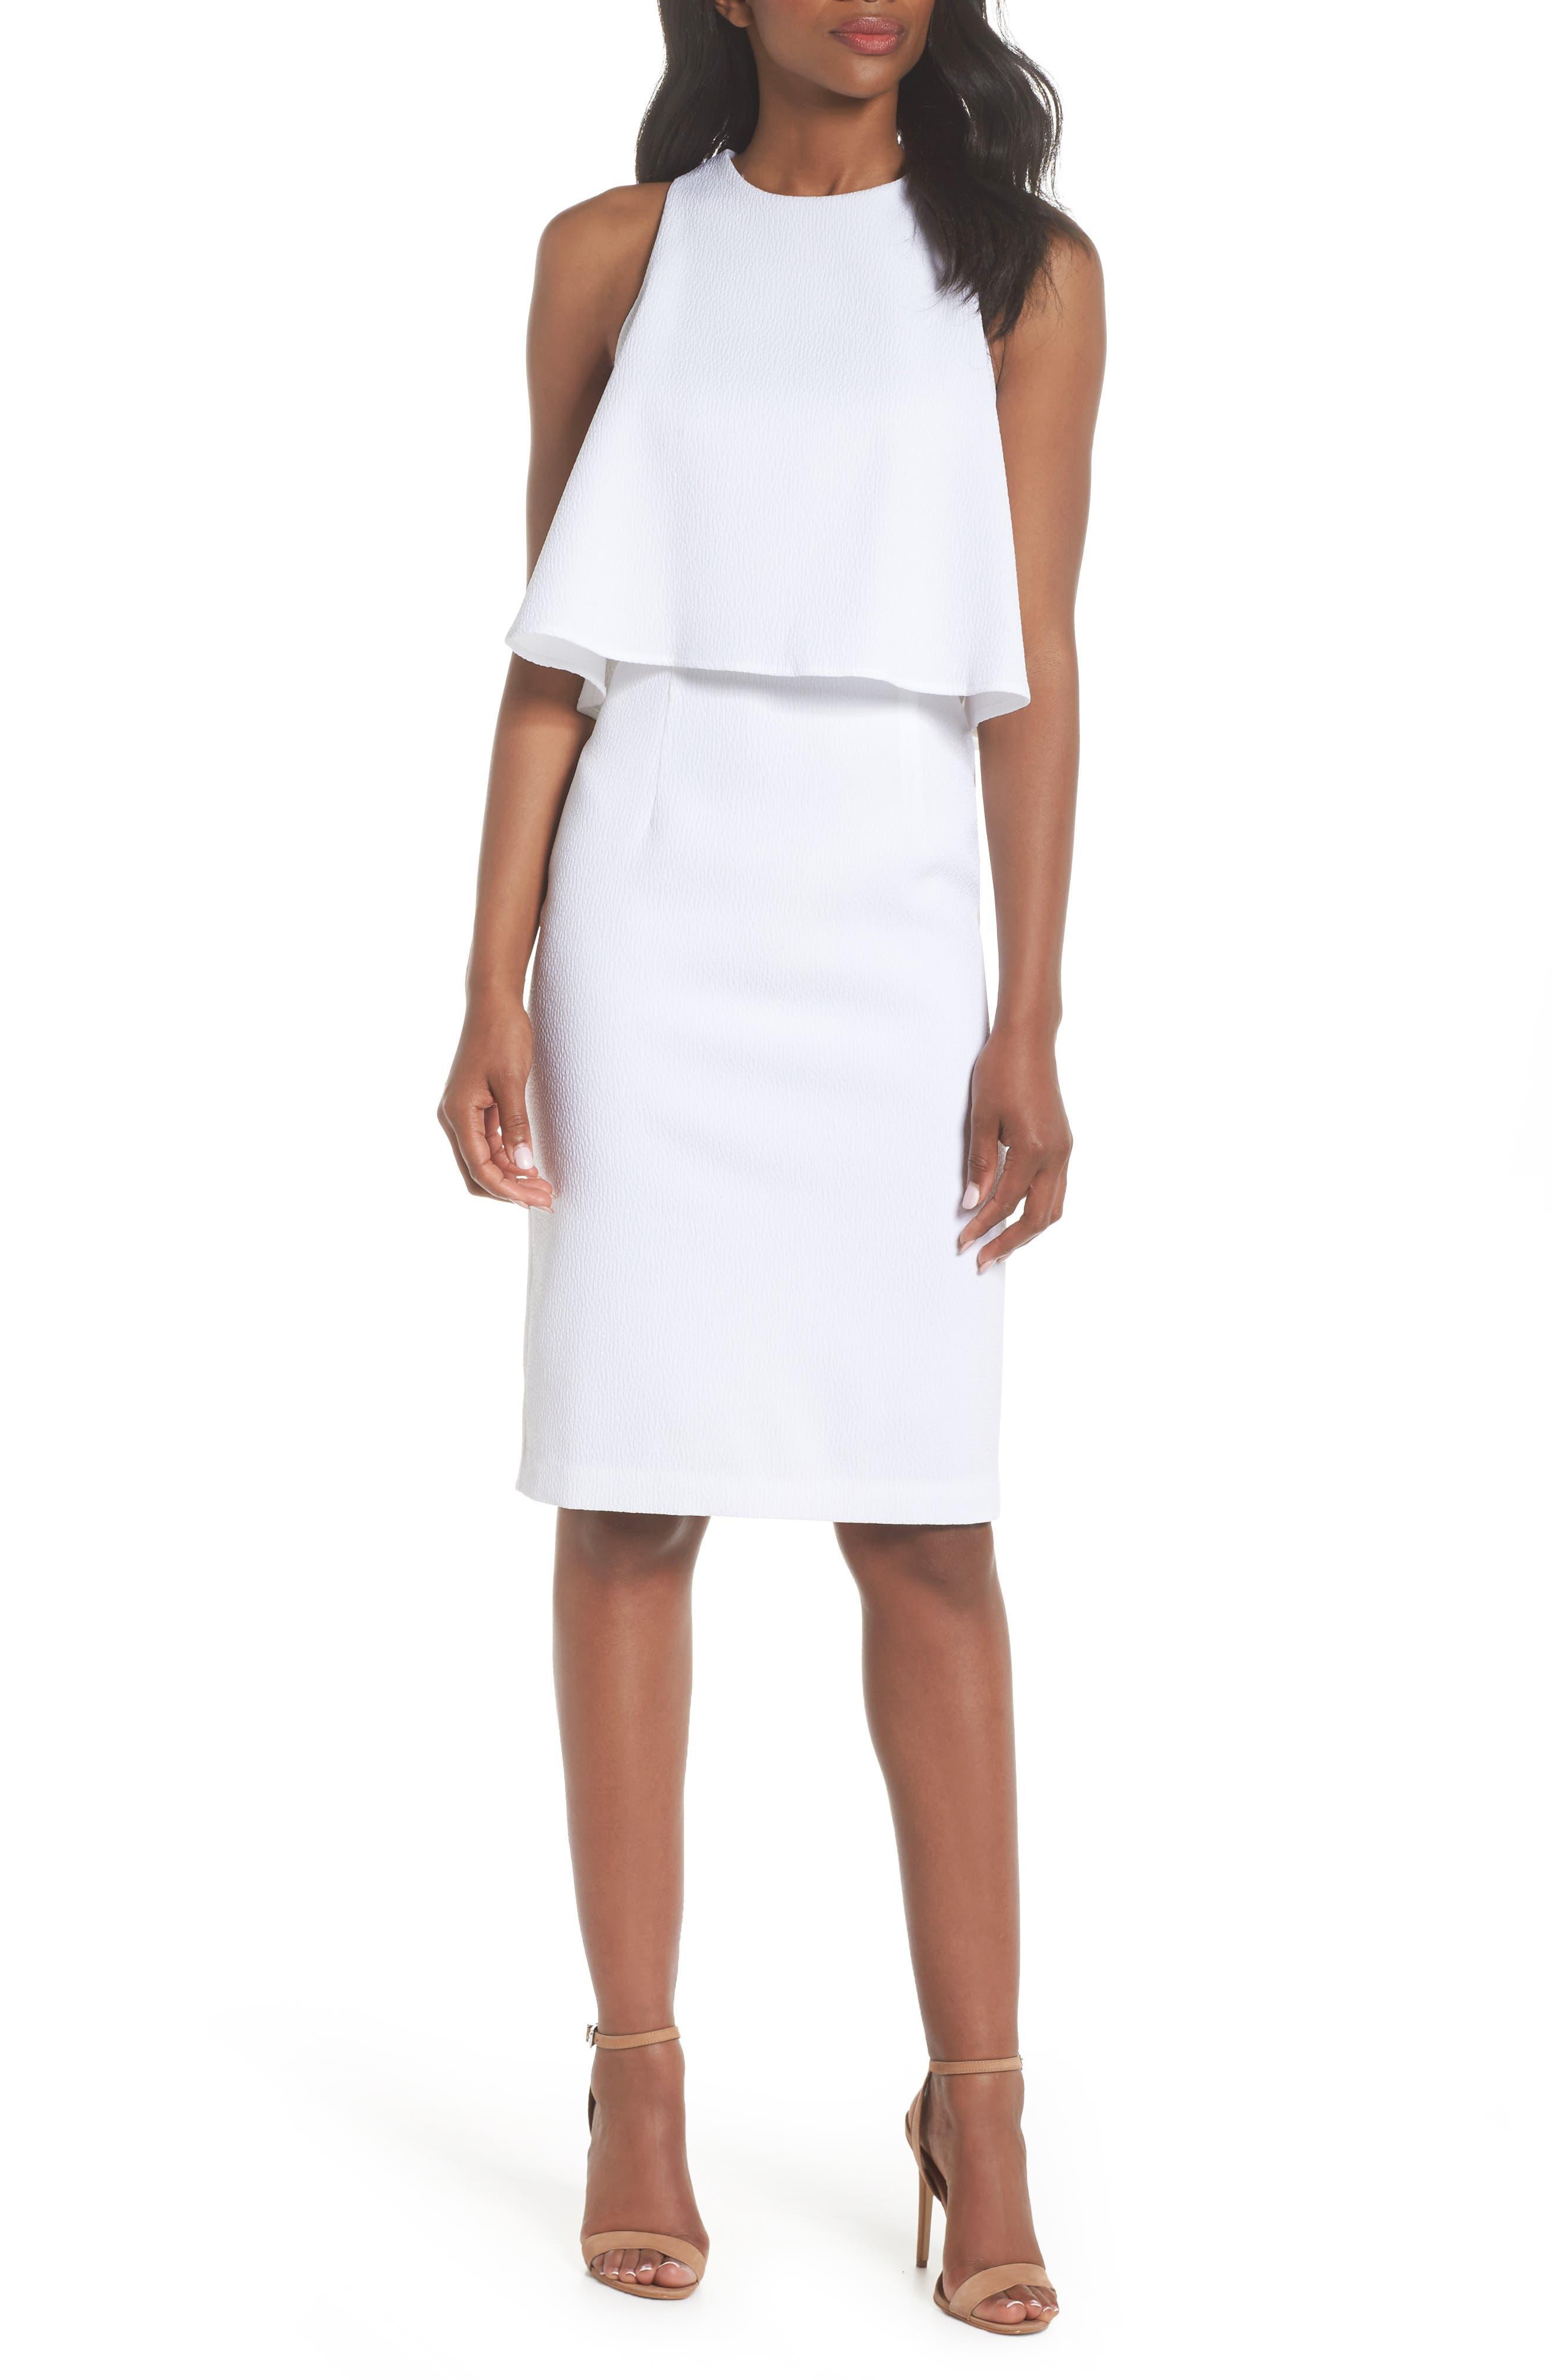 CHELSEA28 Popover Crop Sheath Dress, Main, color, WHITE SNOW